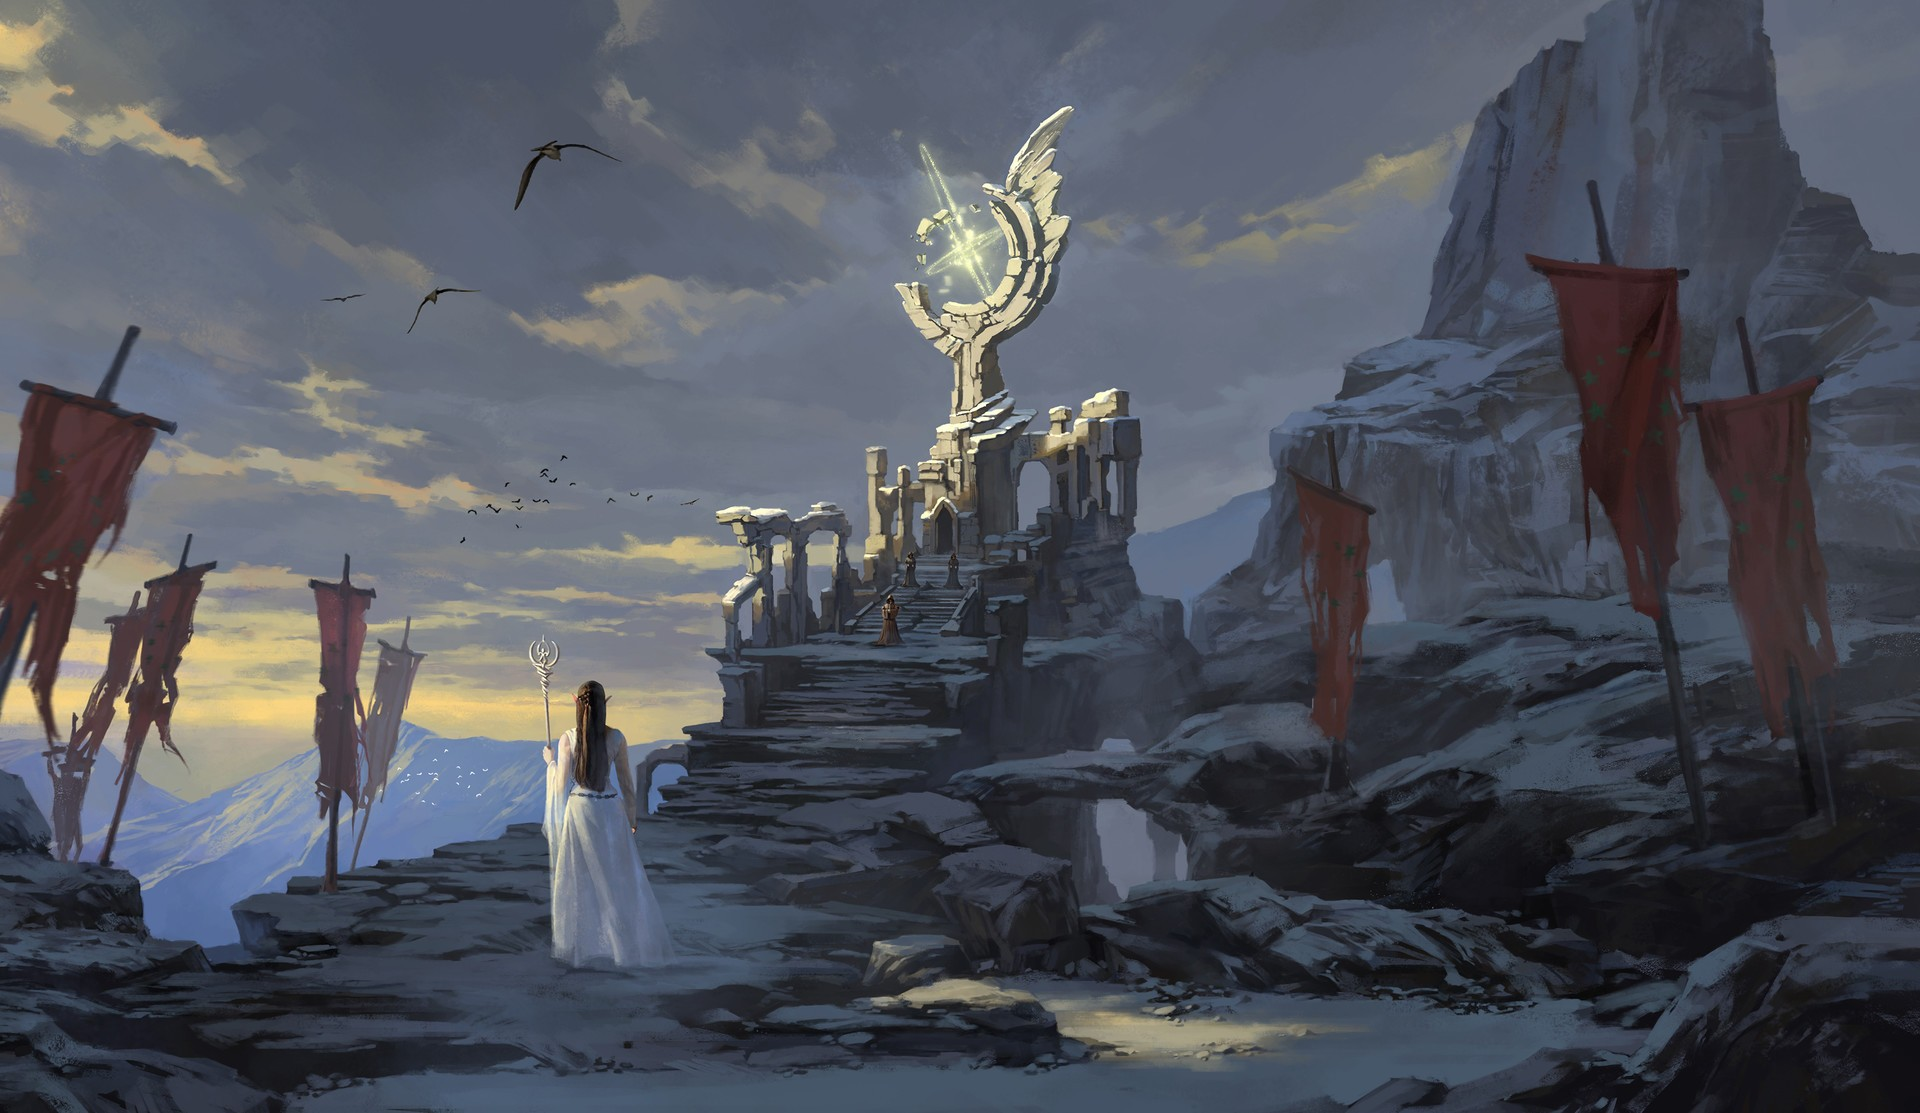 3d Crystal Wallpaper Princess Fantasy Art Throne Magic Wallpapers Hd